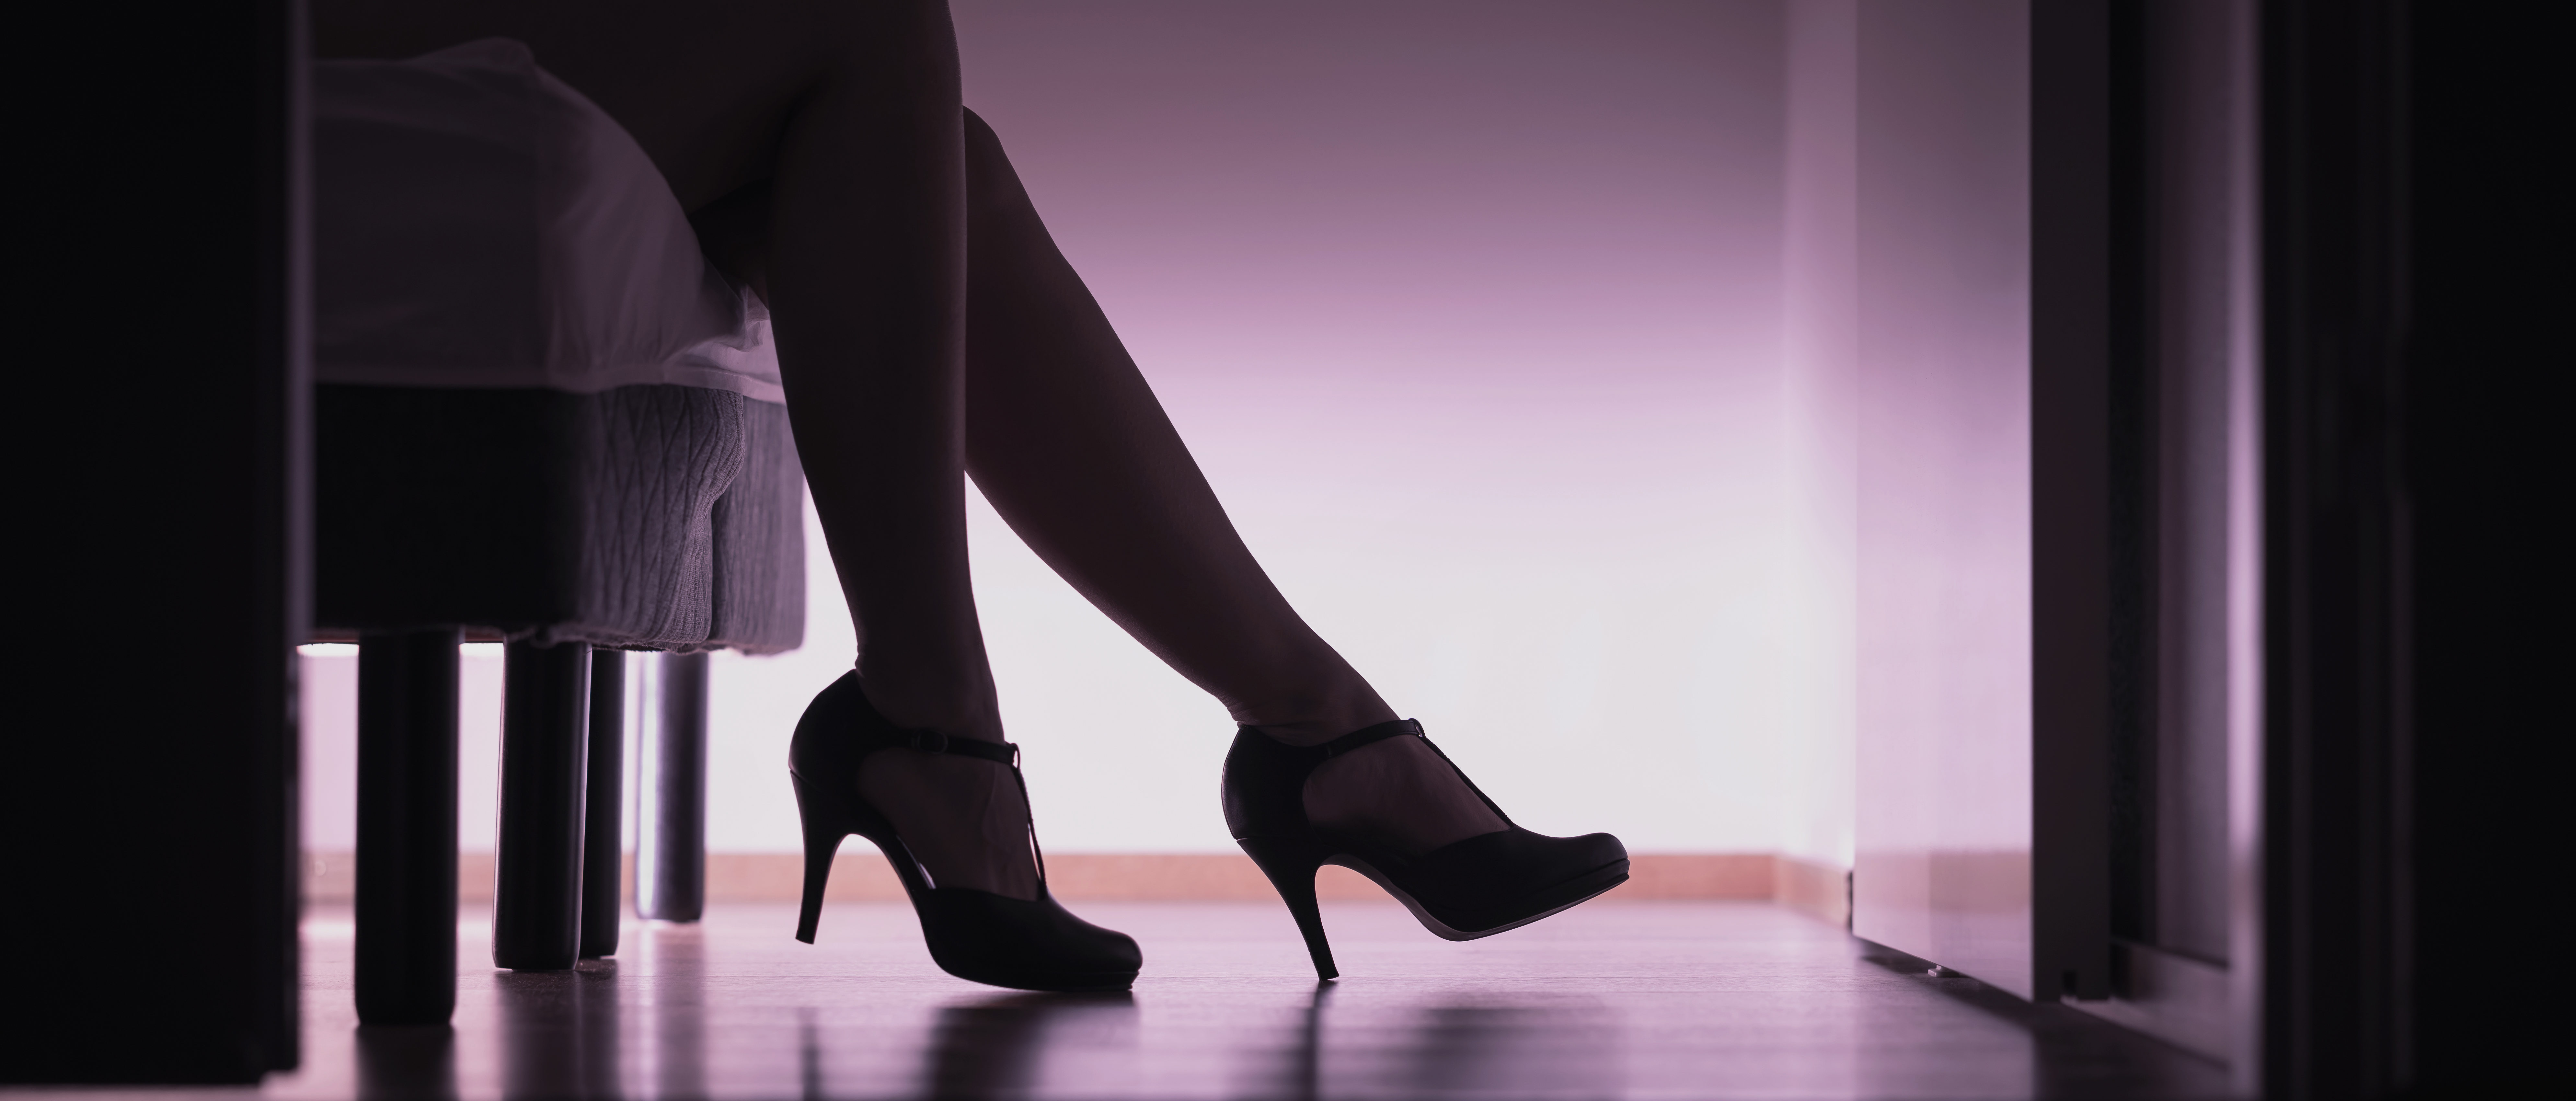 NY lawmakers introduce bill legalizing sex work. Tero Vesalainen, Shutterstock